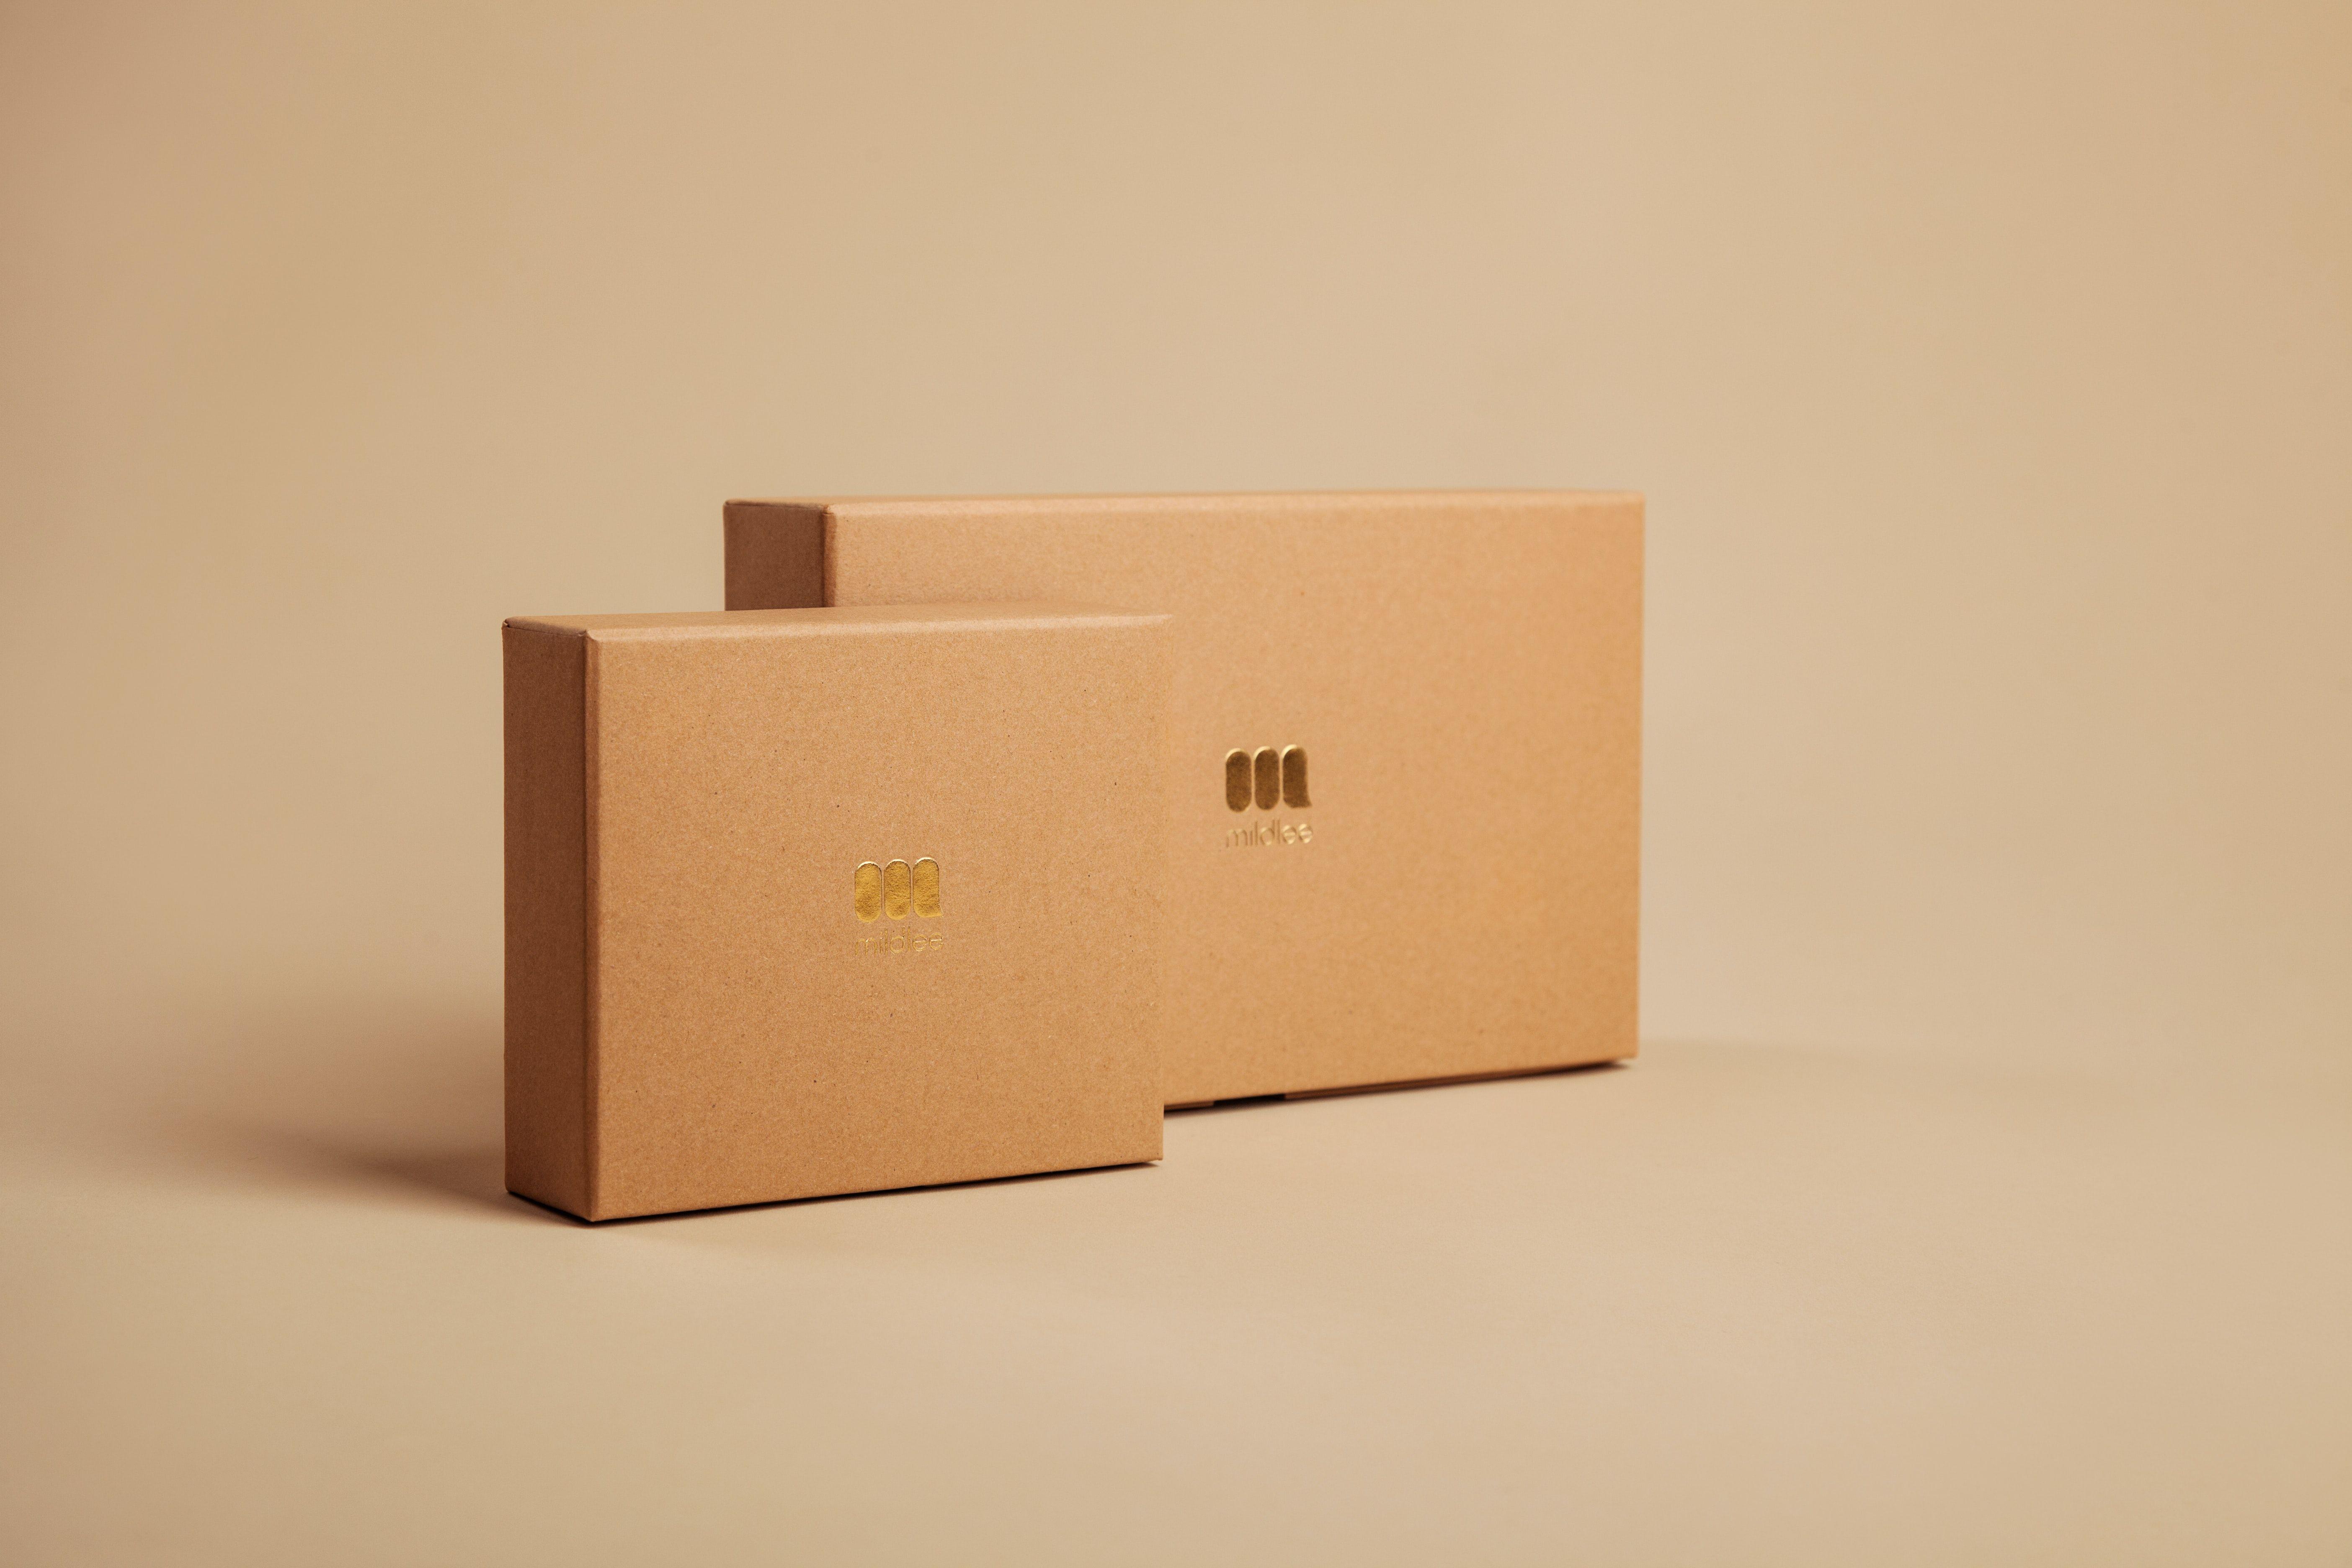 box-shadows-medium.jpg